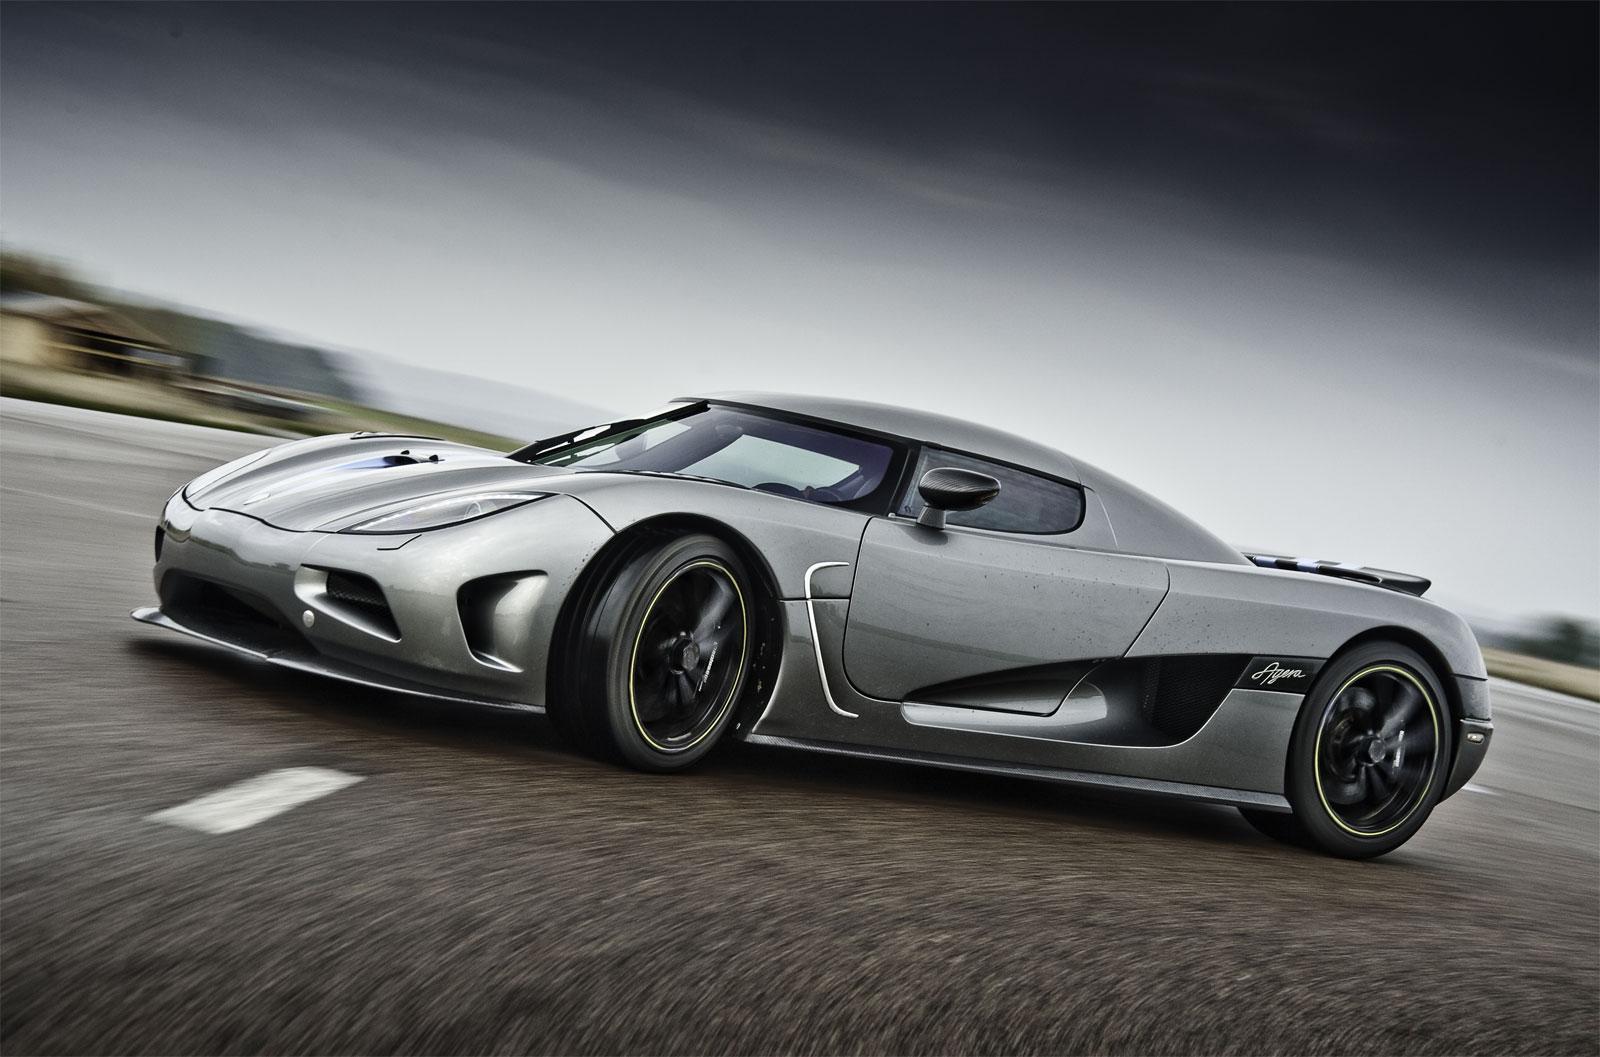 Hd Cars Wallpapers Koenigsegg Agera